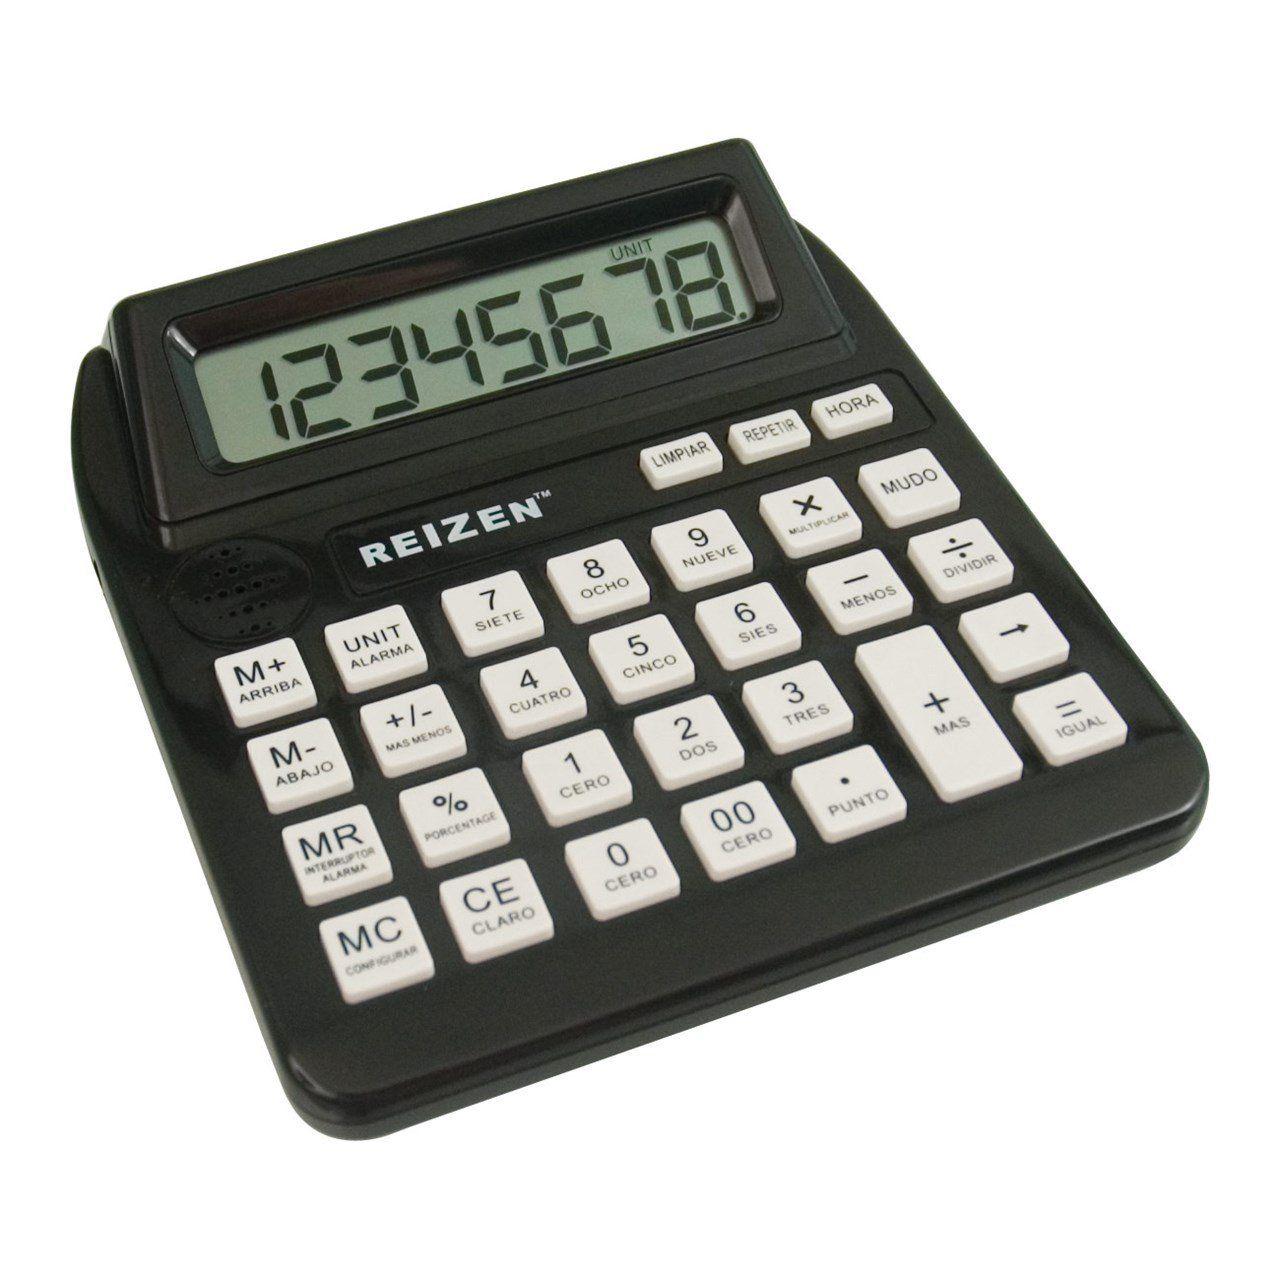 Reizen Talking Calculator with Repeat Key Spanish